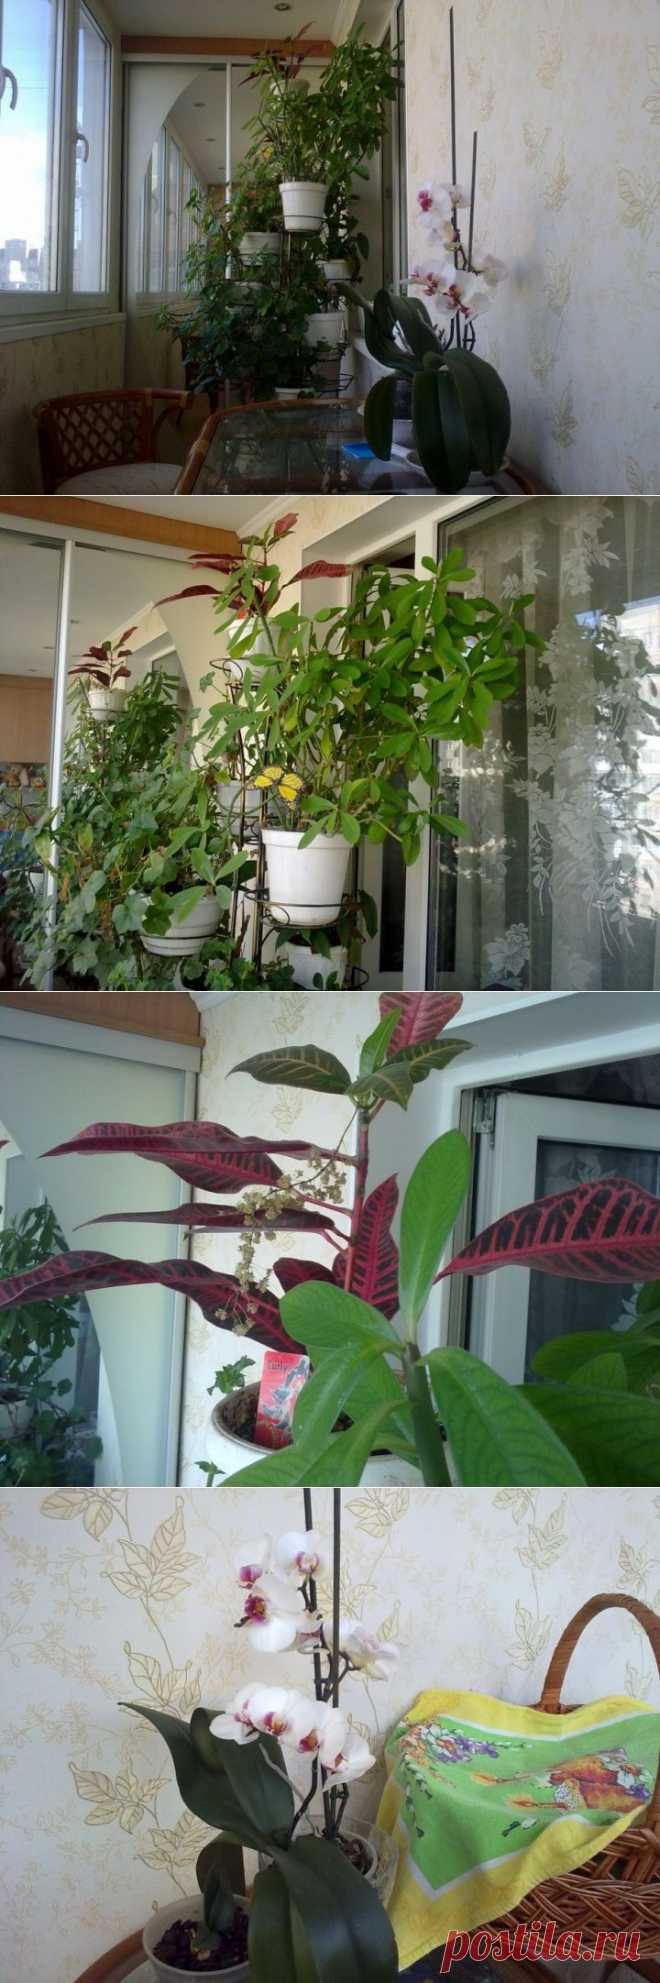 Садочек на утепленной лоджии.   Школа Ремонта